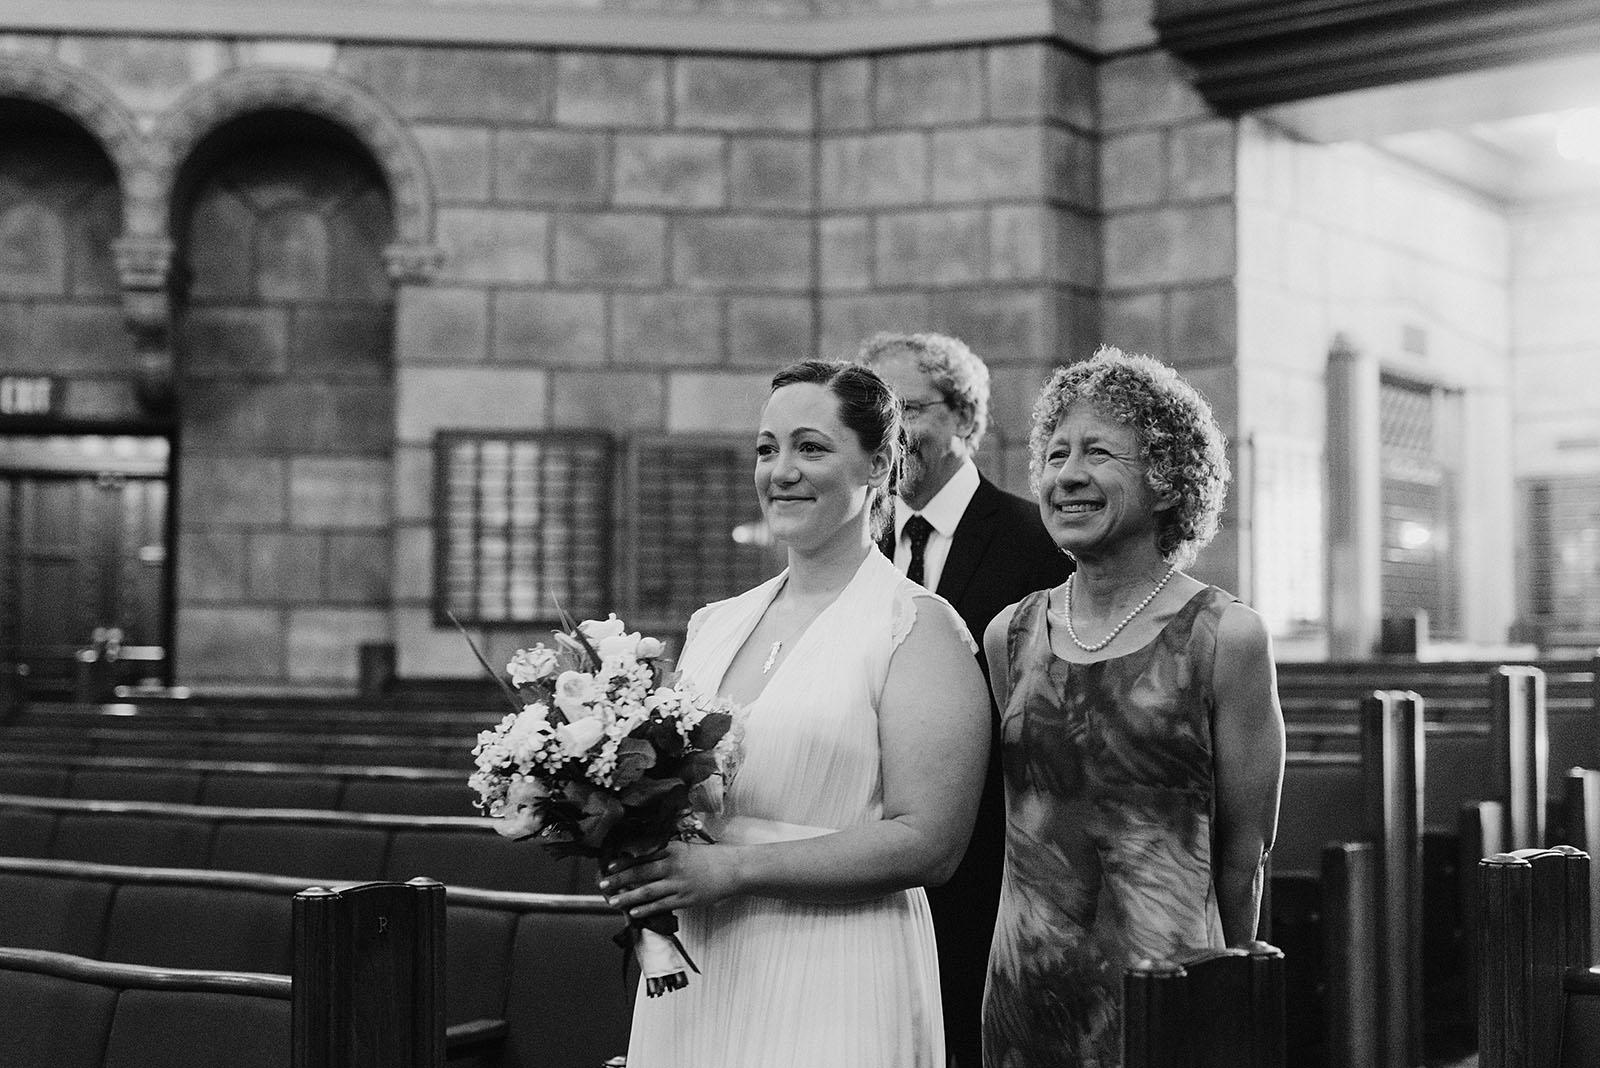 Bride walking down the aisle of a Congregation Beth Israel wedding